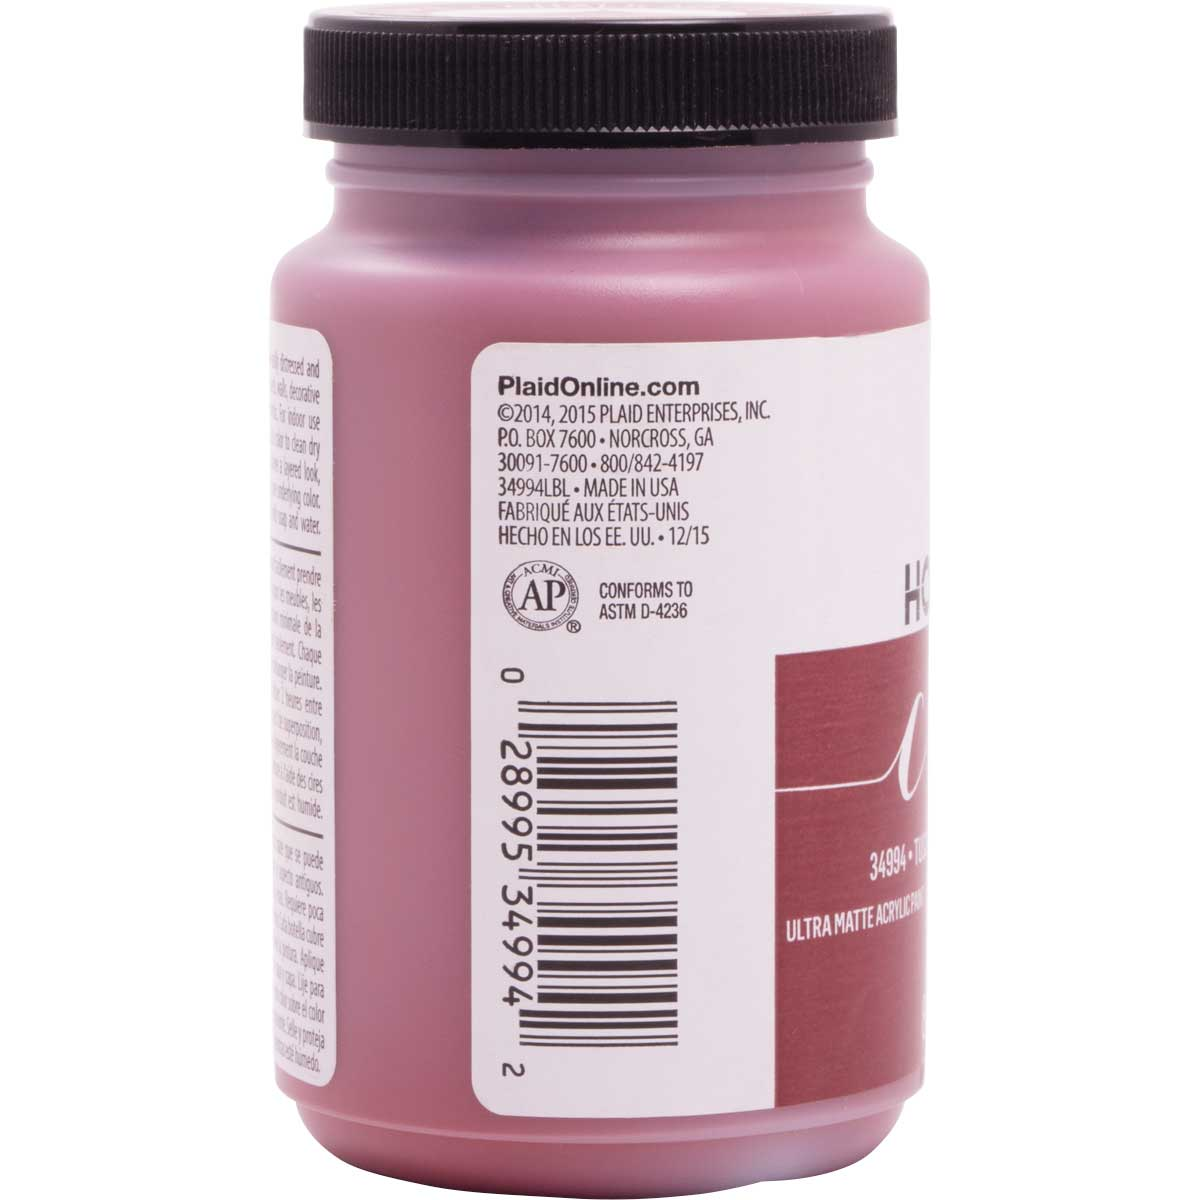 FolkArt ® Home Decor™ Chalk - Tuscan Red, 8 oz.